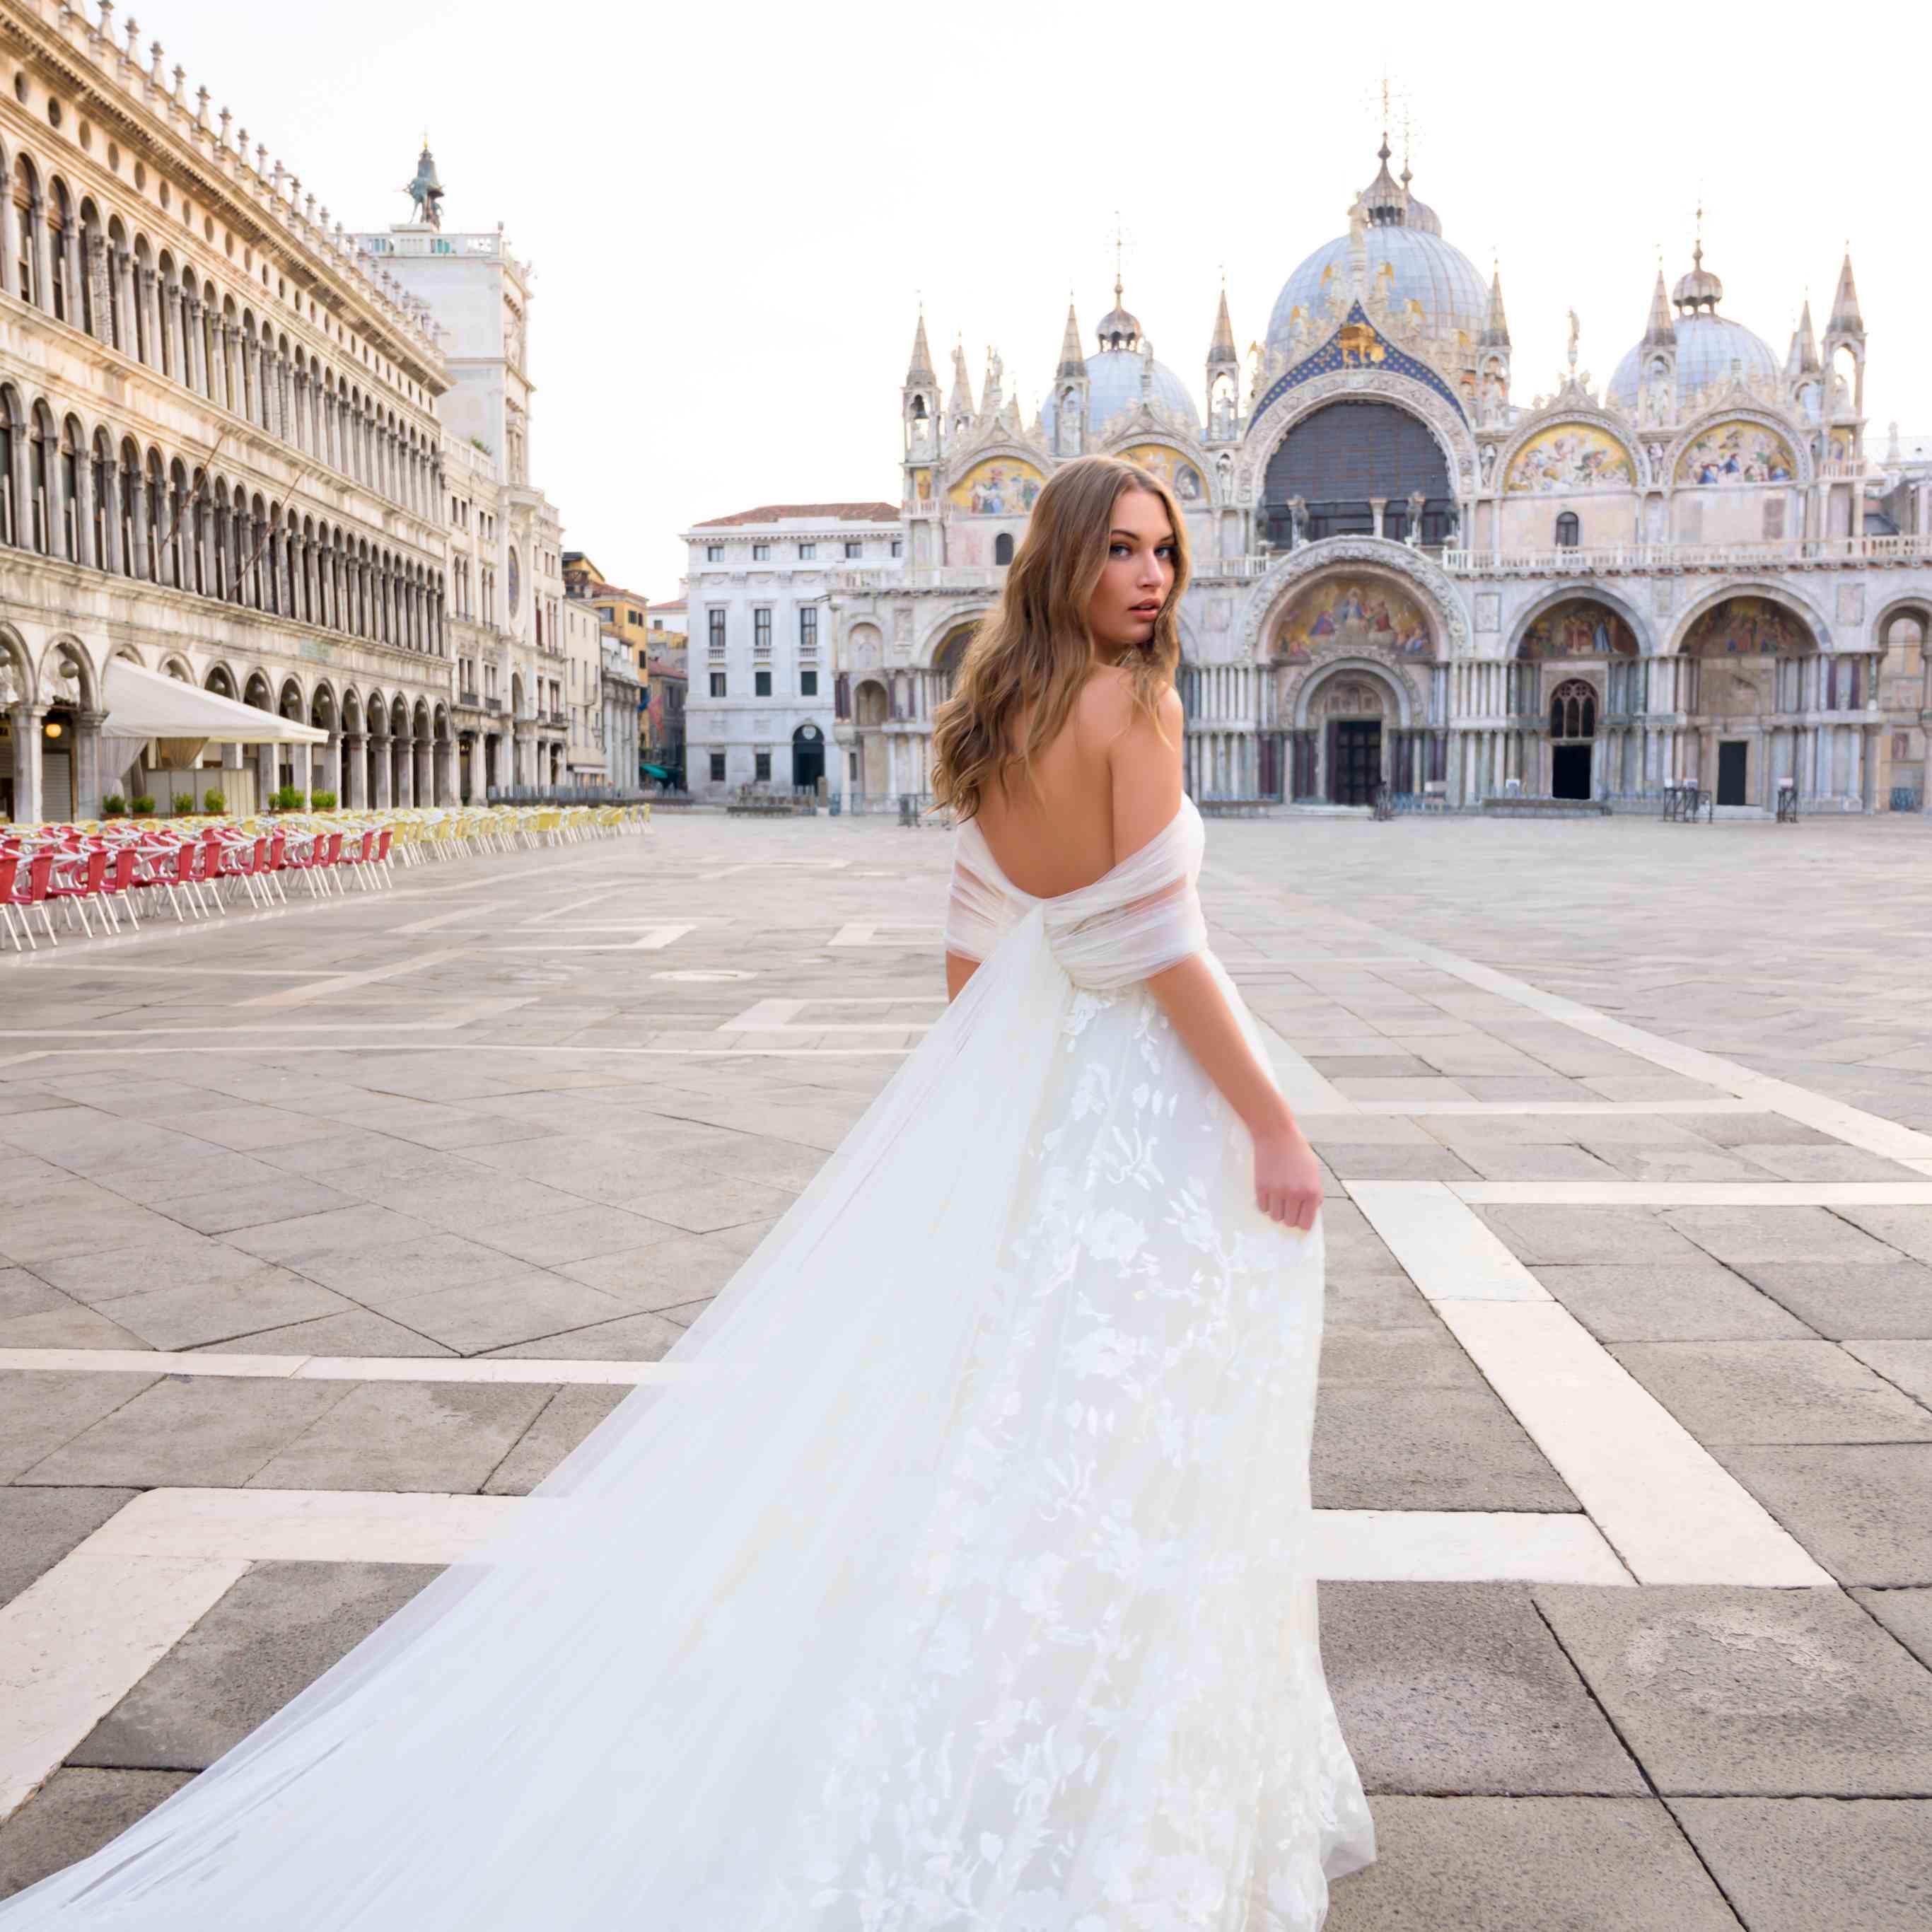 Bliss Monique Lhuillier Bridal Wedding Dress Collection Fall 2020